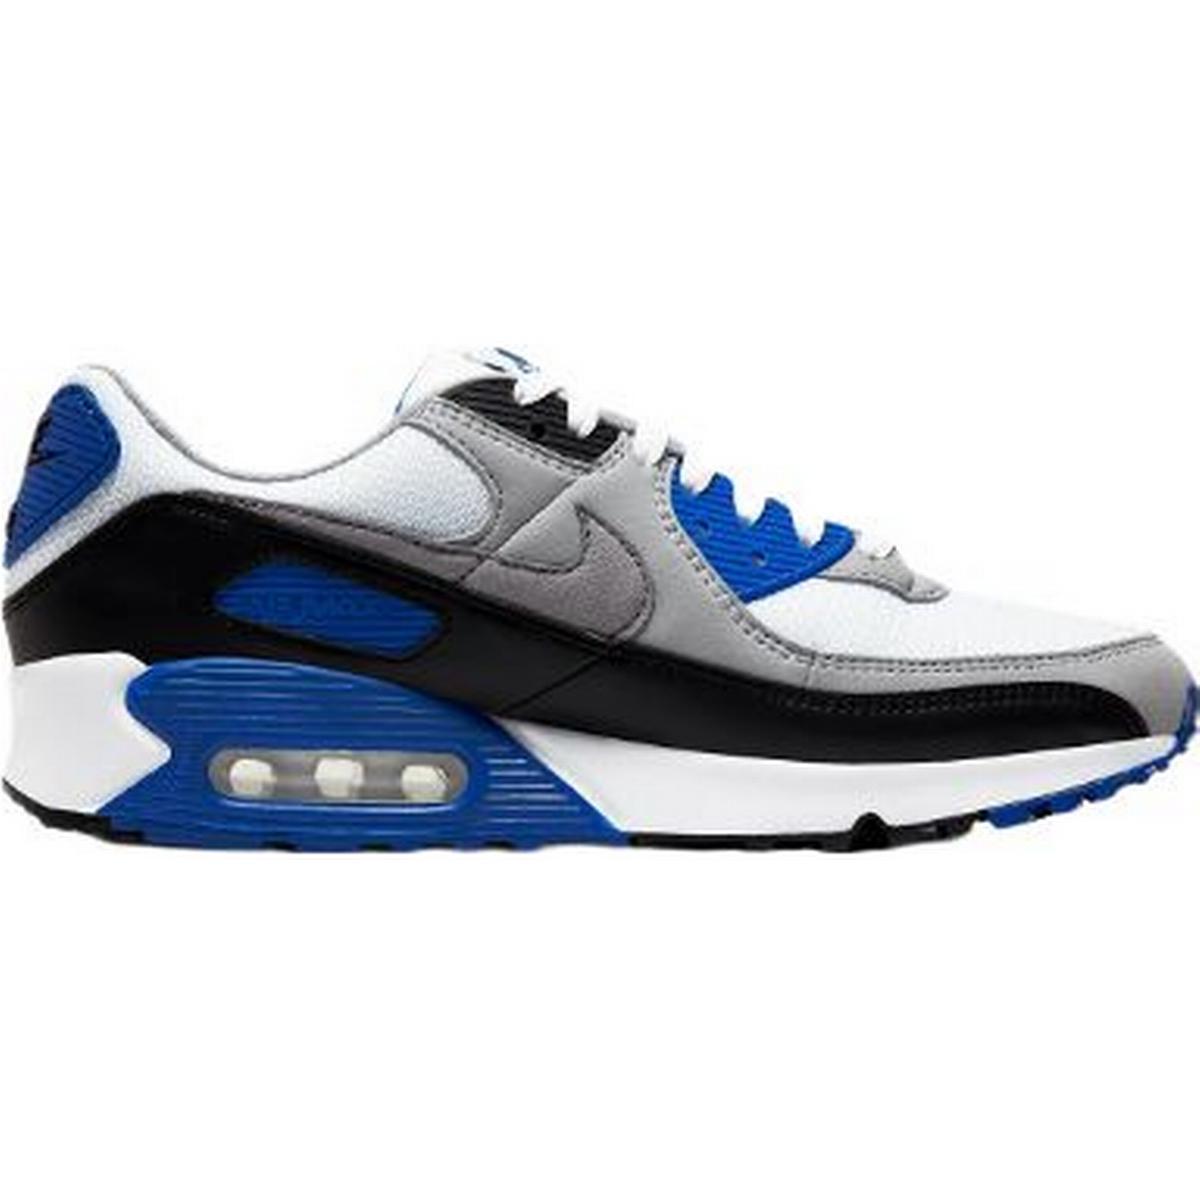 Nike air max 90 42 • Hitta det lägsta priset hos PriceRunner